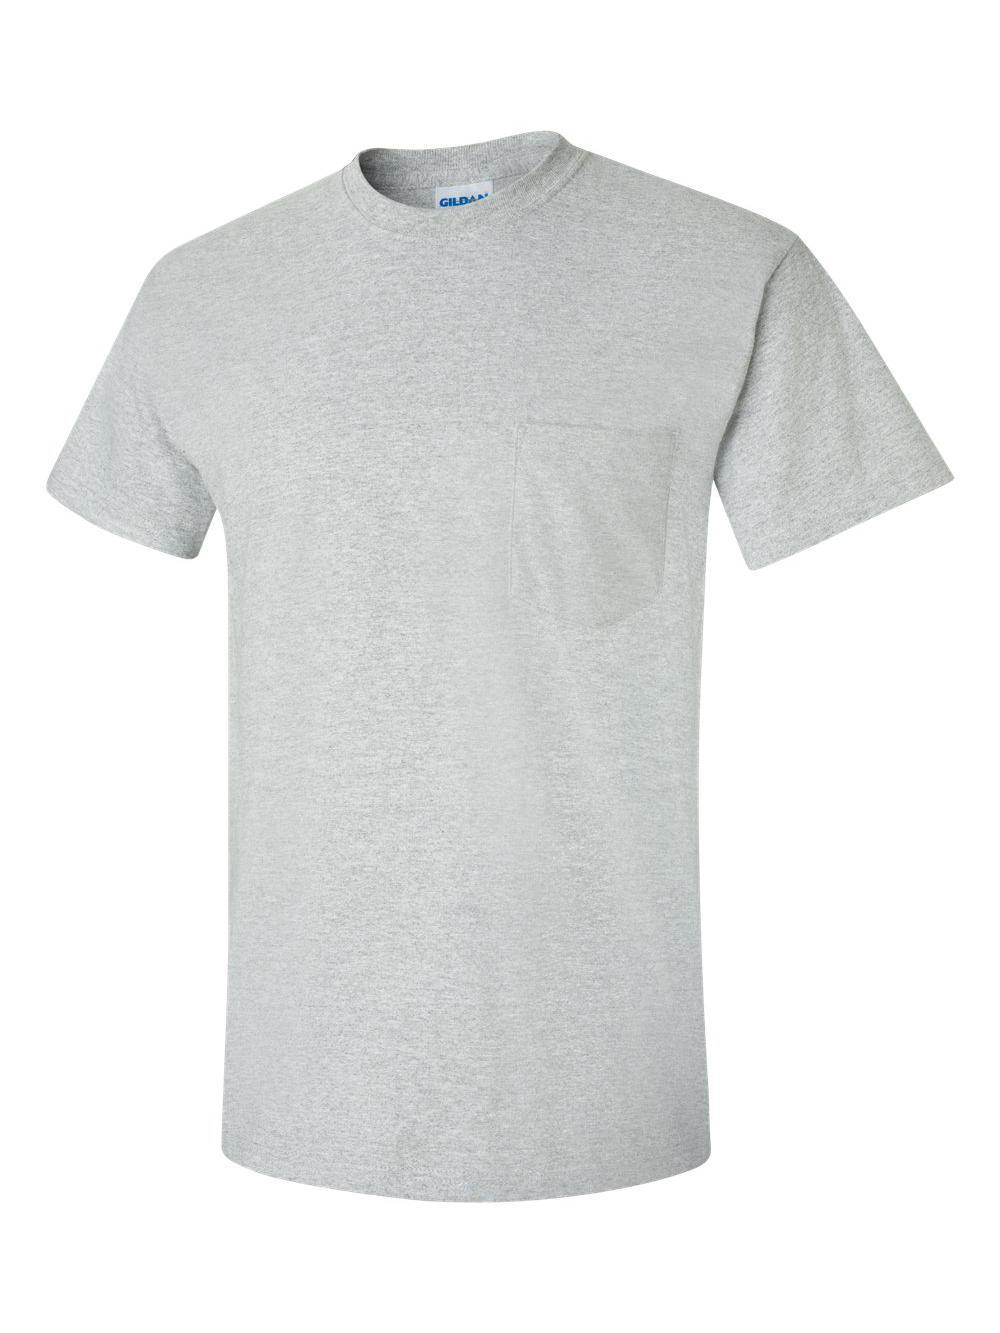 Gildan-Ultra-Cotton-T-Shirt-with-a-Pocket-2300 thumbnail 42